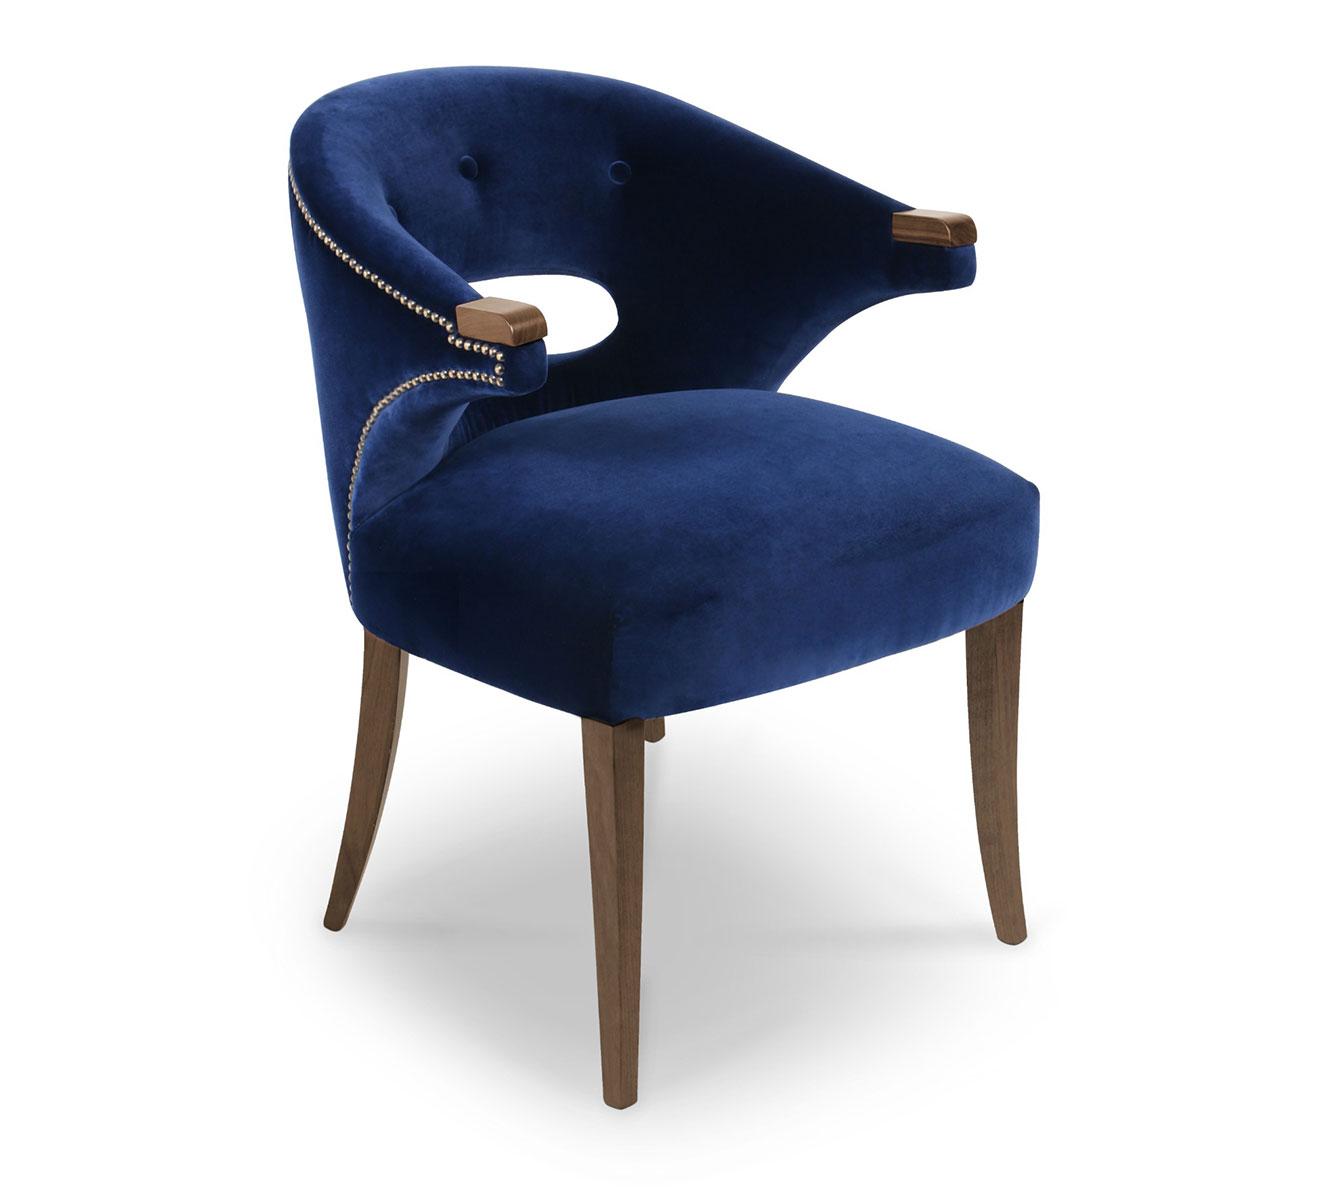 see through dining chairs teal chair nanook by brabbu demorais international